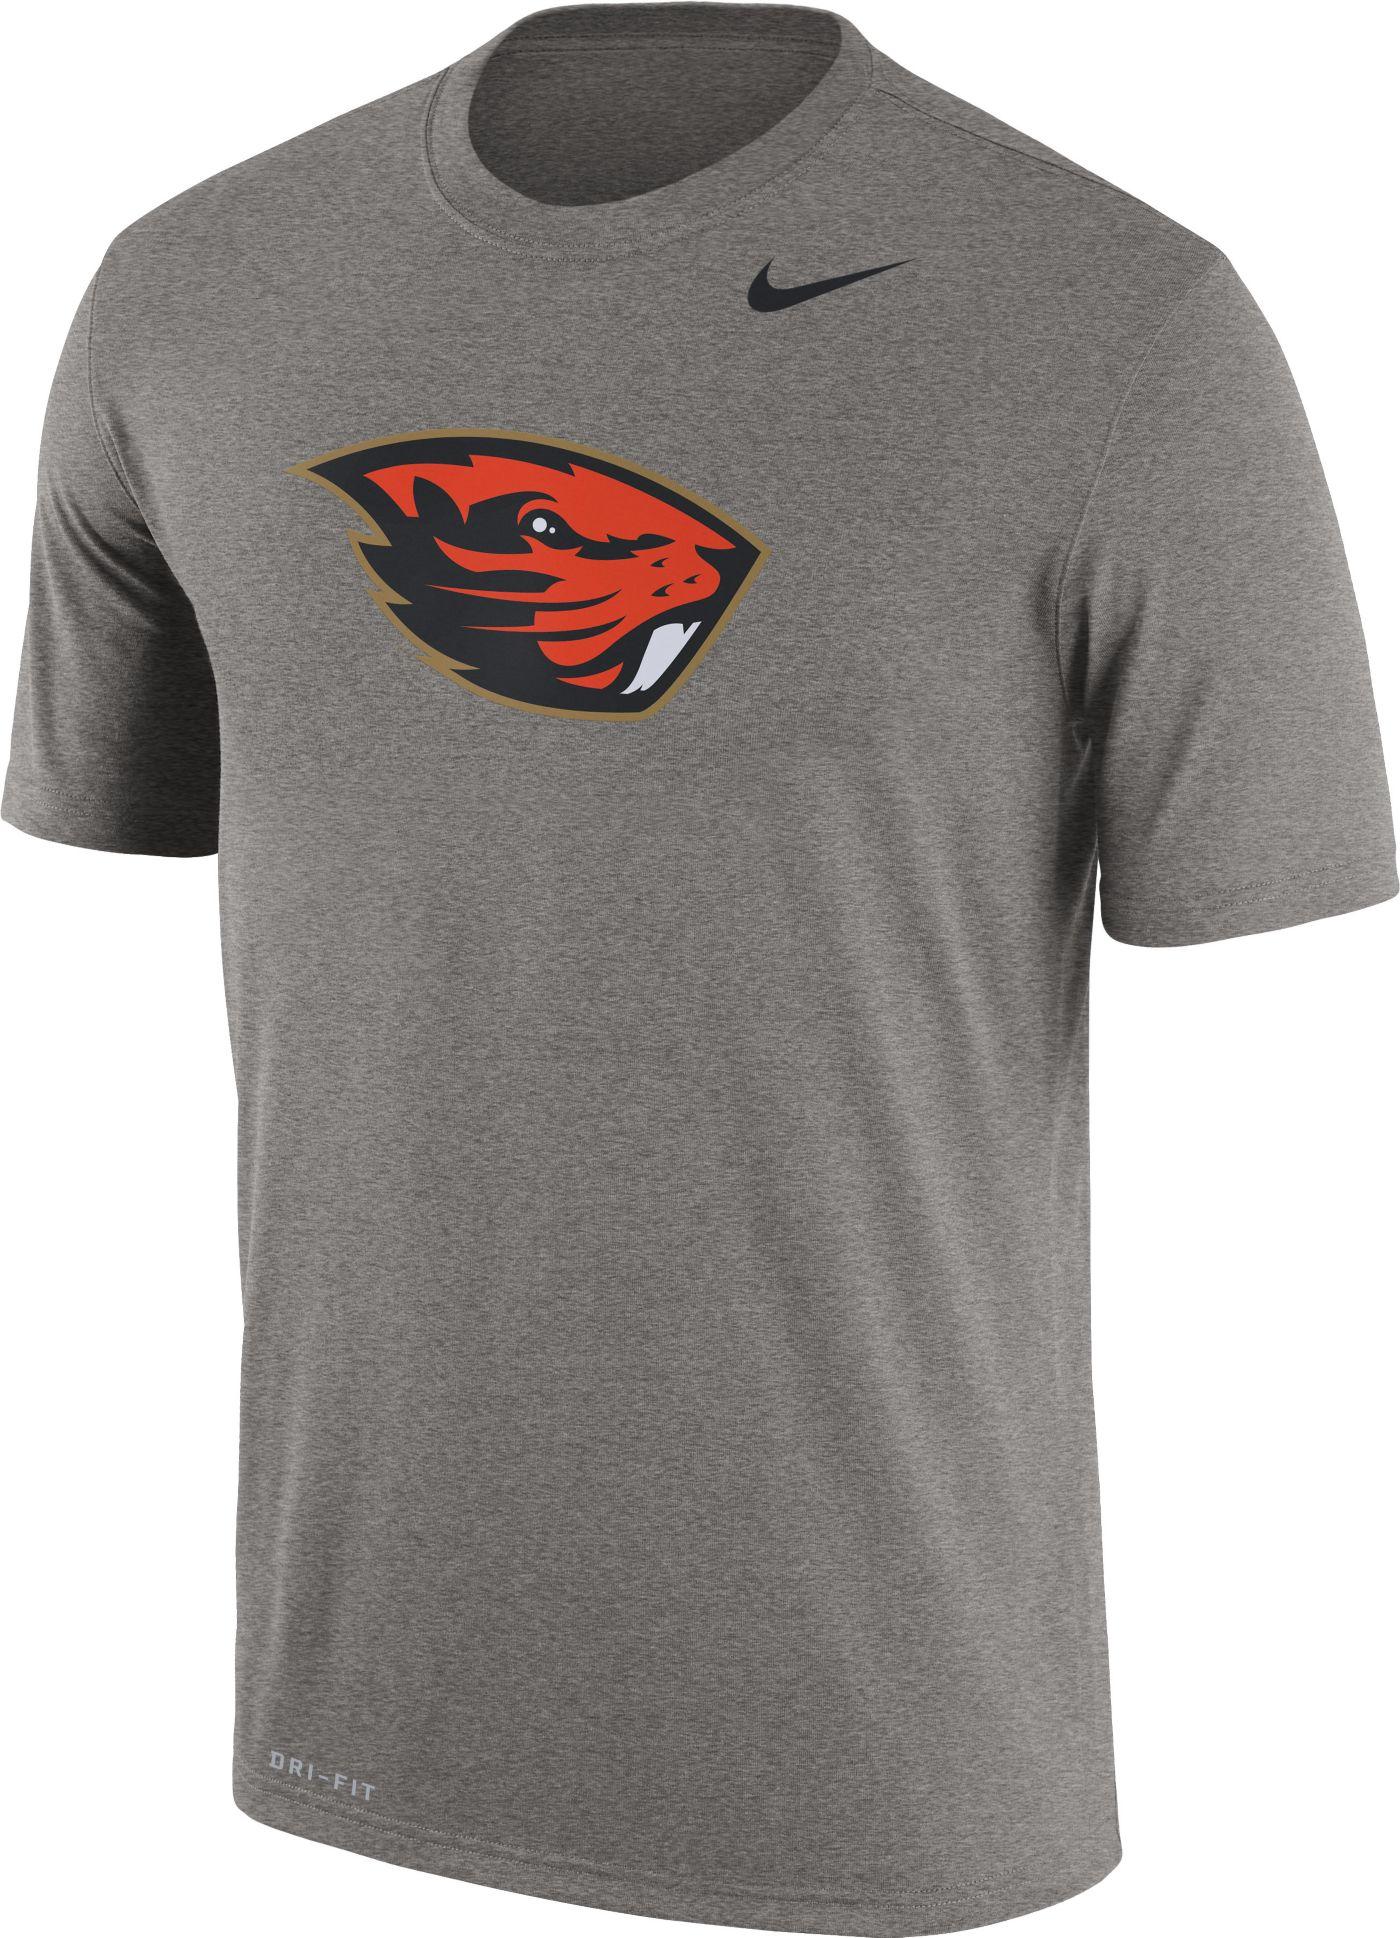 Nike Men's Oregon State Beavers Grey Logo Dry Legend T-Shirt